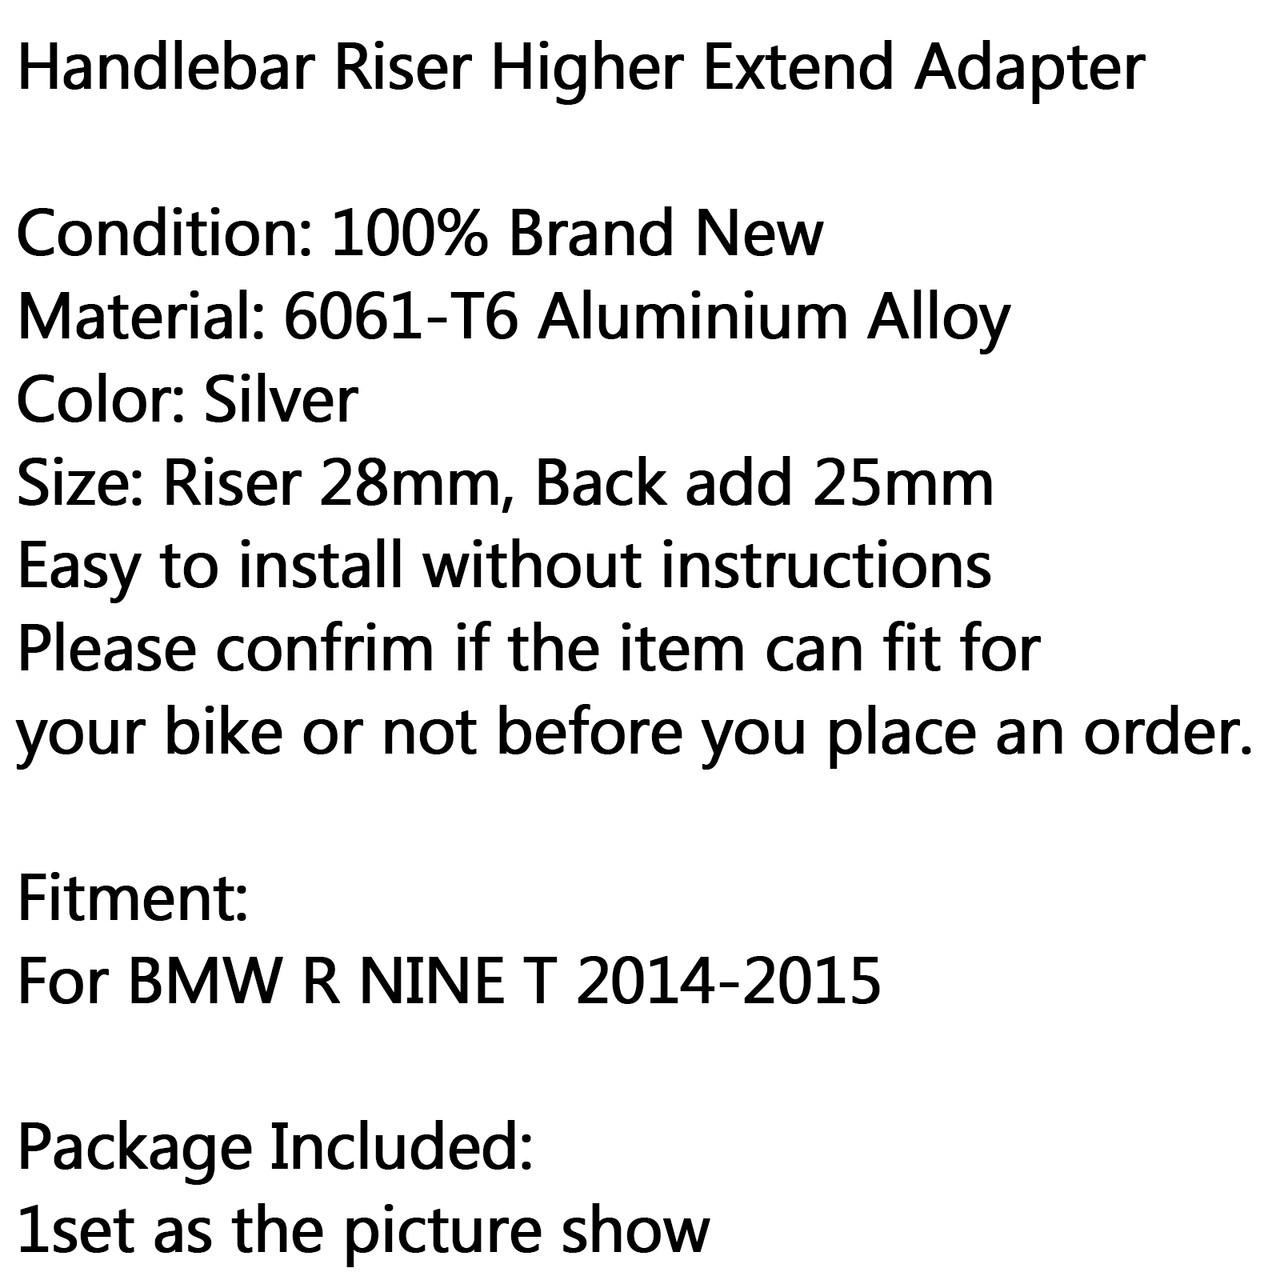 28mm Riser Handlebar Higher Extend Adapter Add BMW R1200 R NINE T (2014-2015), Silver